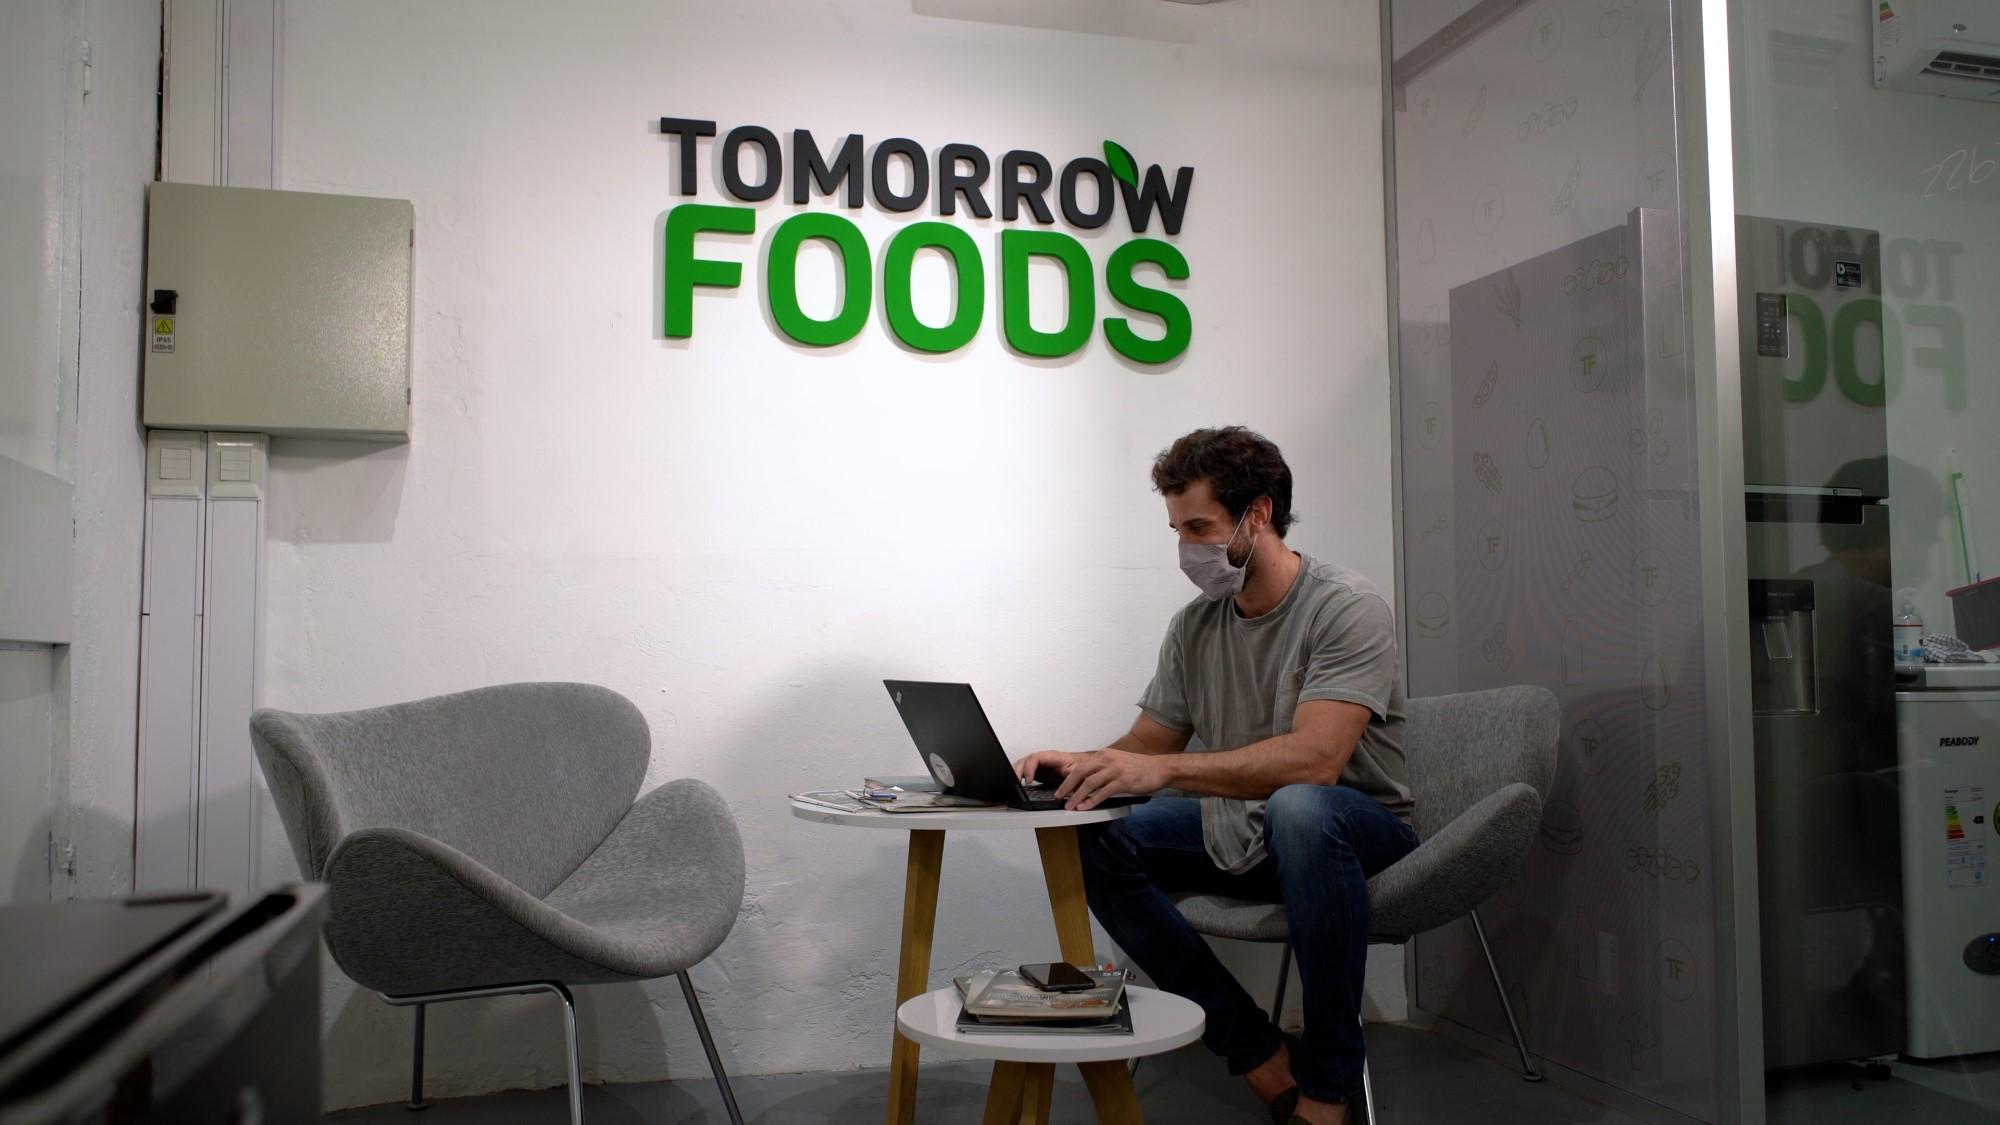 Tomorrow Foods